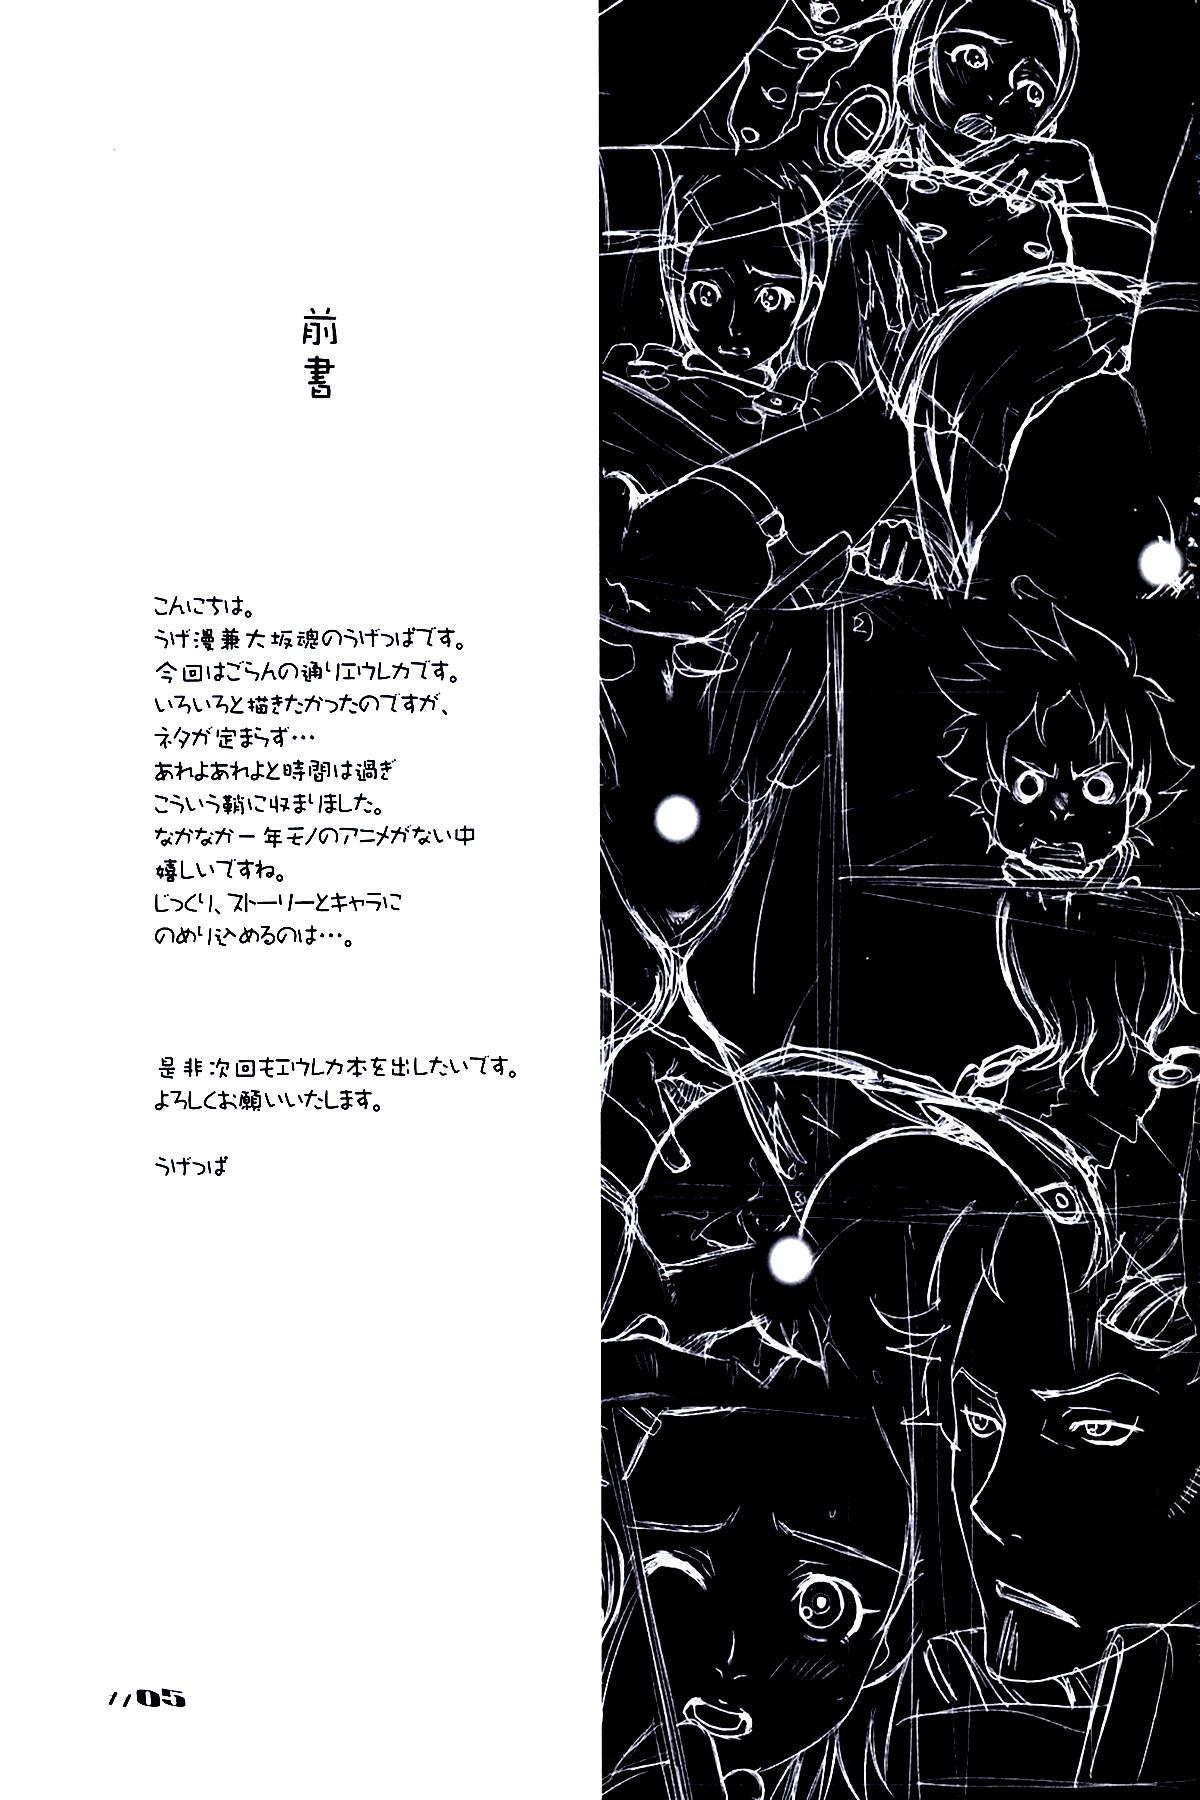 (C68) [UGEMAN (Ugeppa)] -RX- (Eureka Seven) [English] [ATF] 2